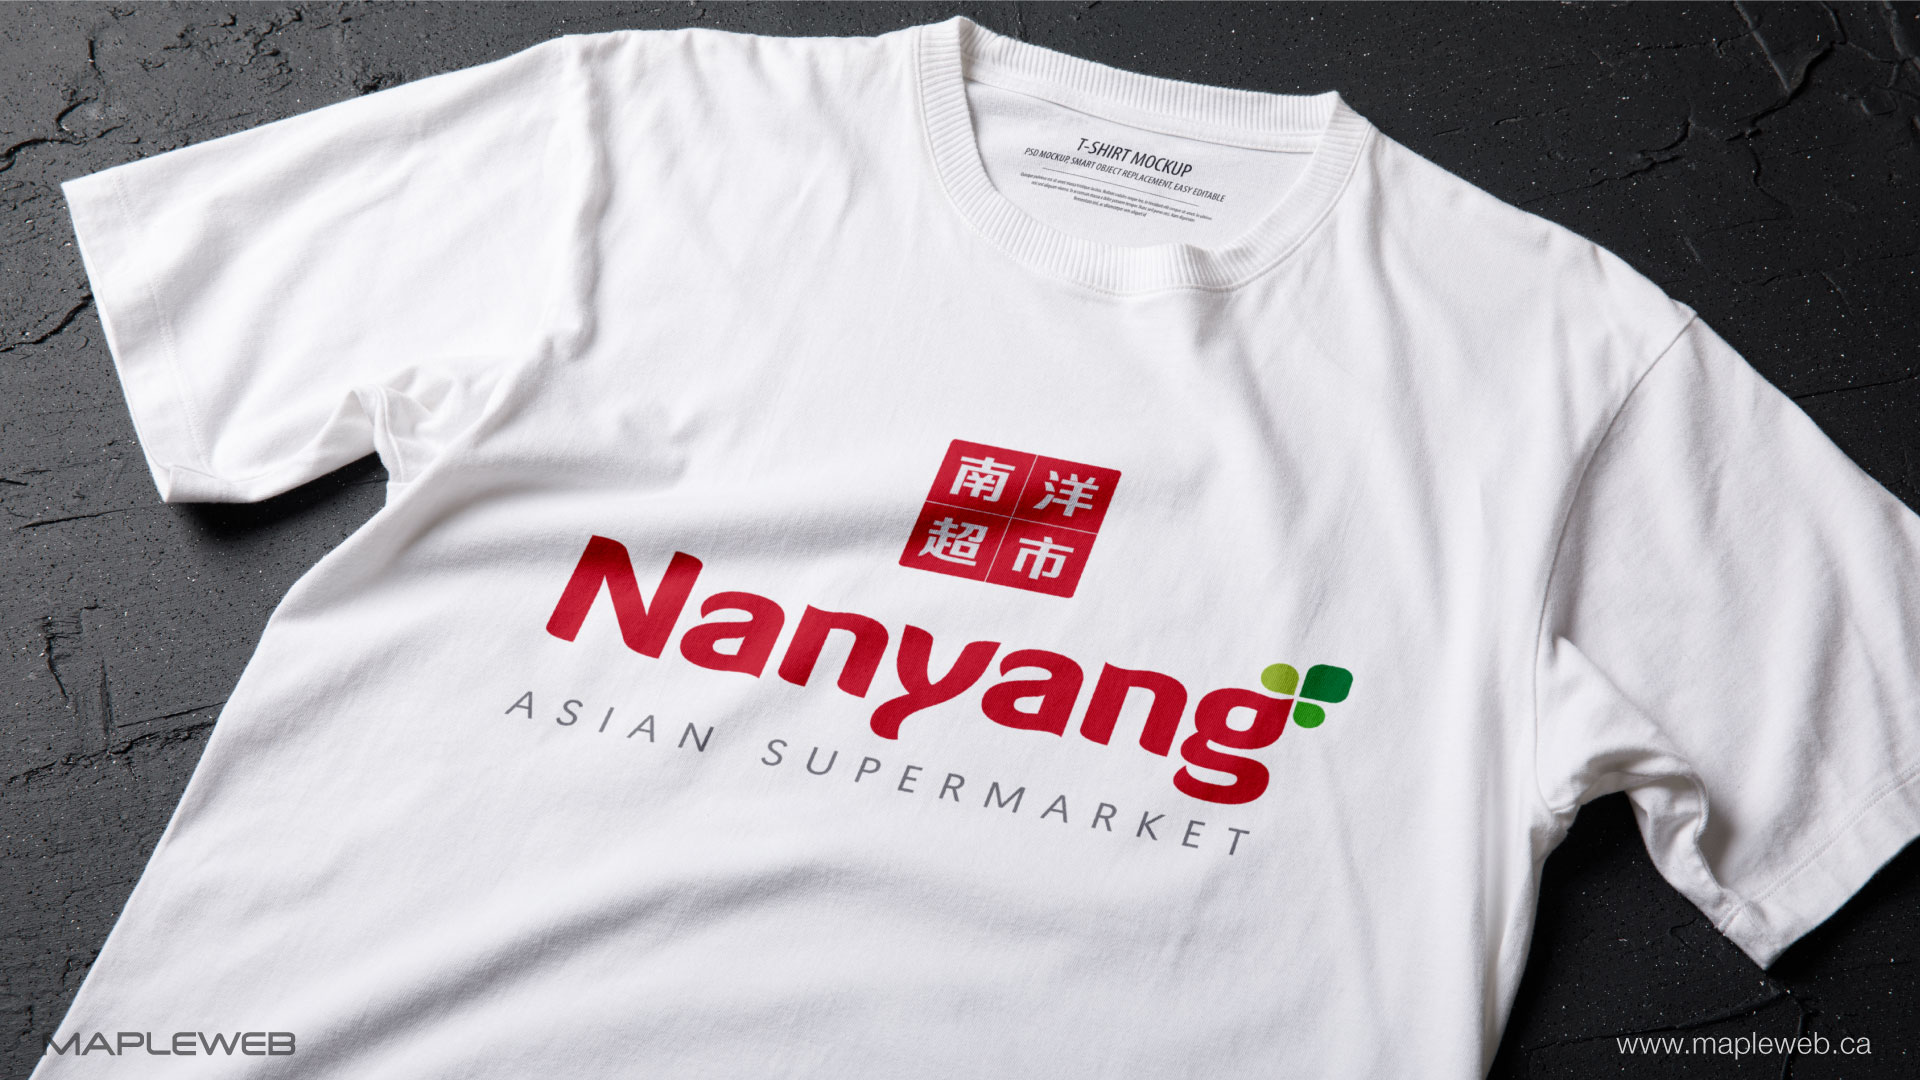 nanyang-brand-logo-design-by-mapleweb-vancouver-canada-tshirt-mock